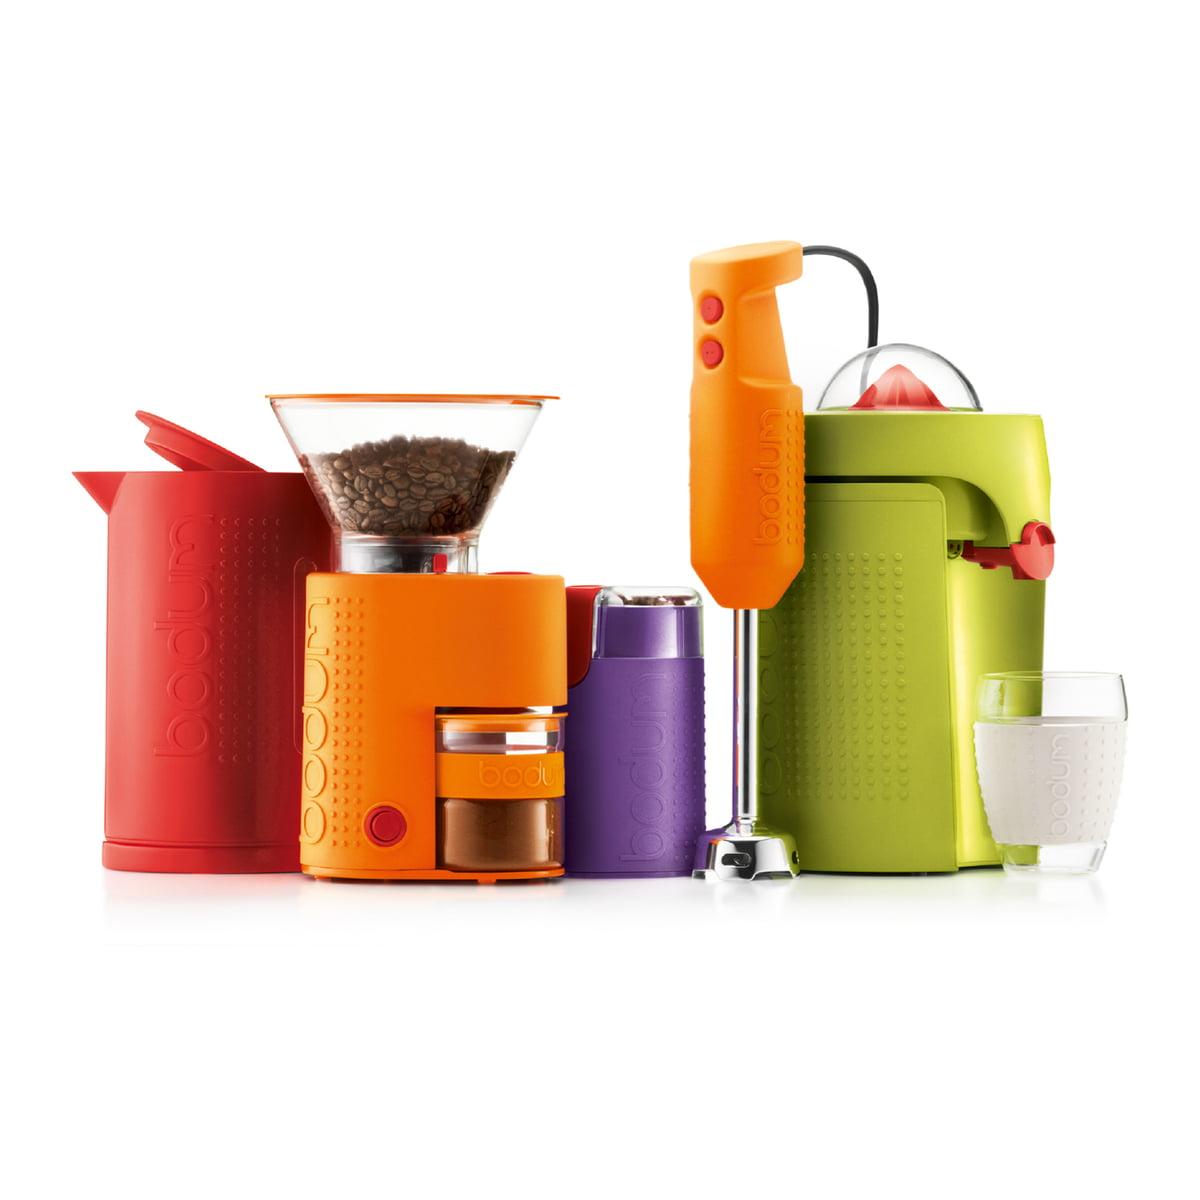 Bodum Bistro elektrisk kaffemølle 11160